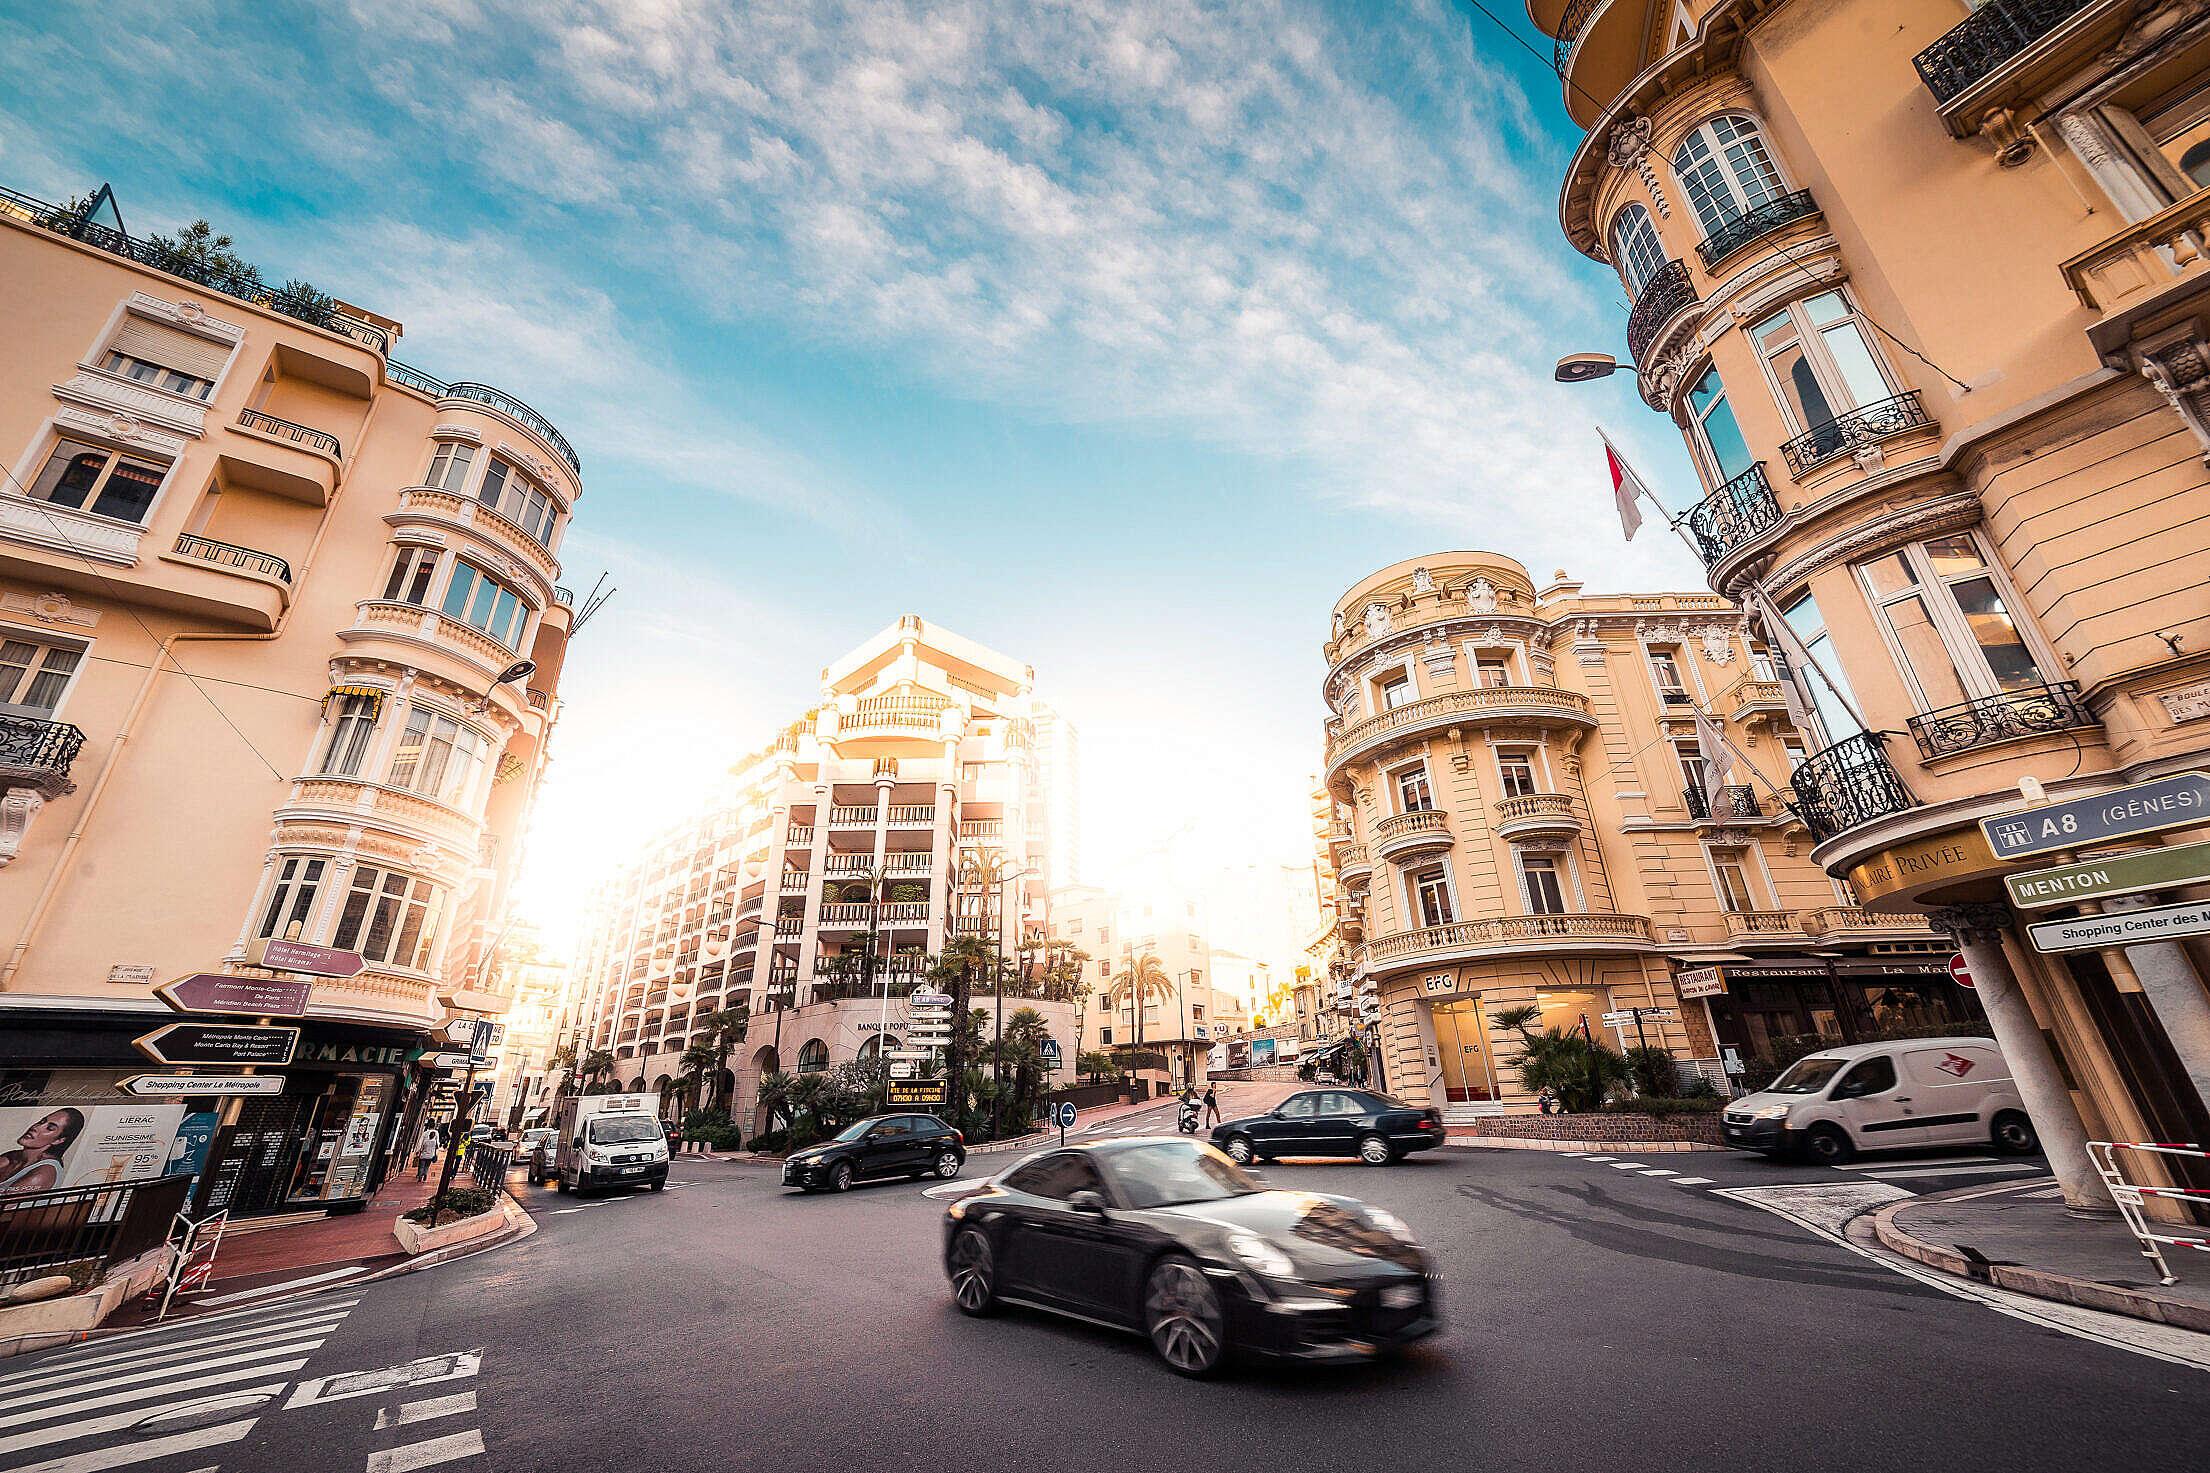 Rich Streets of Monaco Free Stock Photo